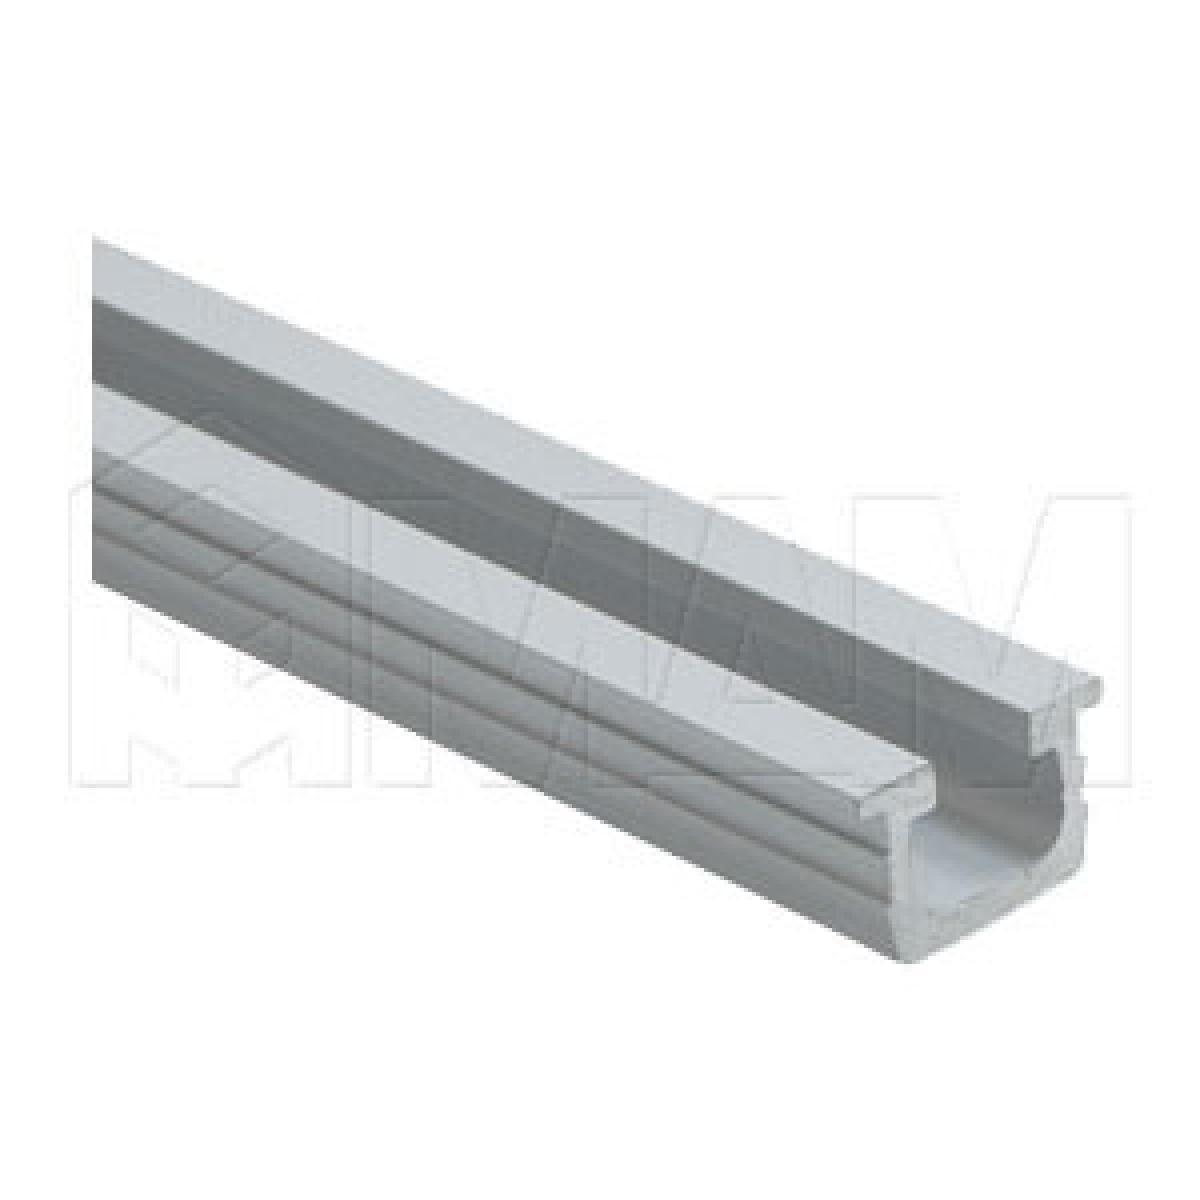 PS03 Направляющая верх/низ, серебро анодир., L-6000